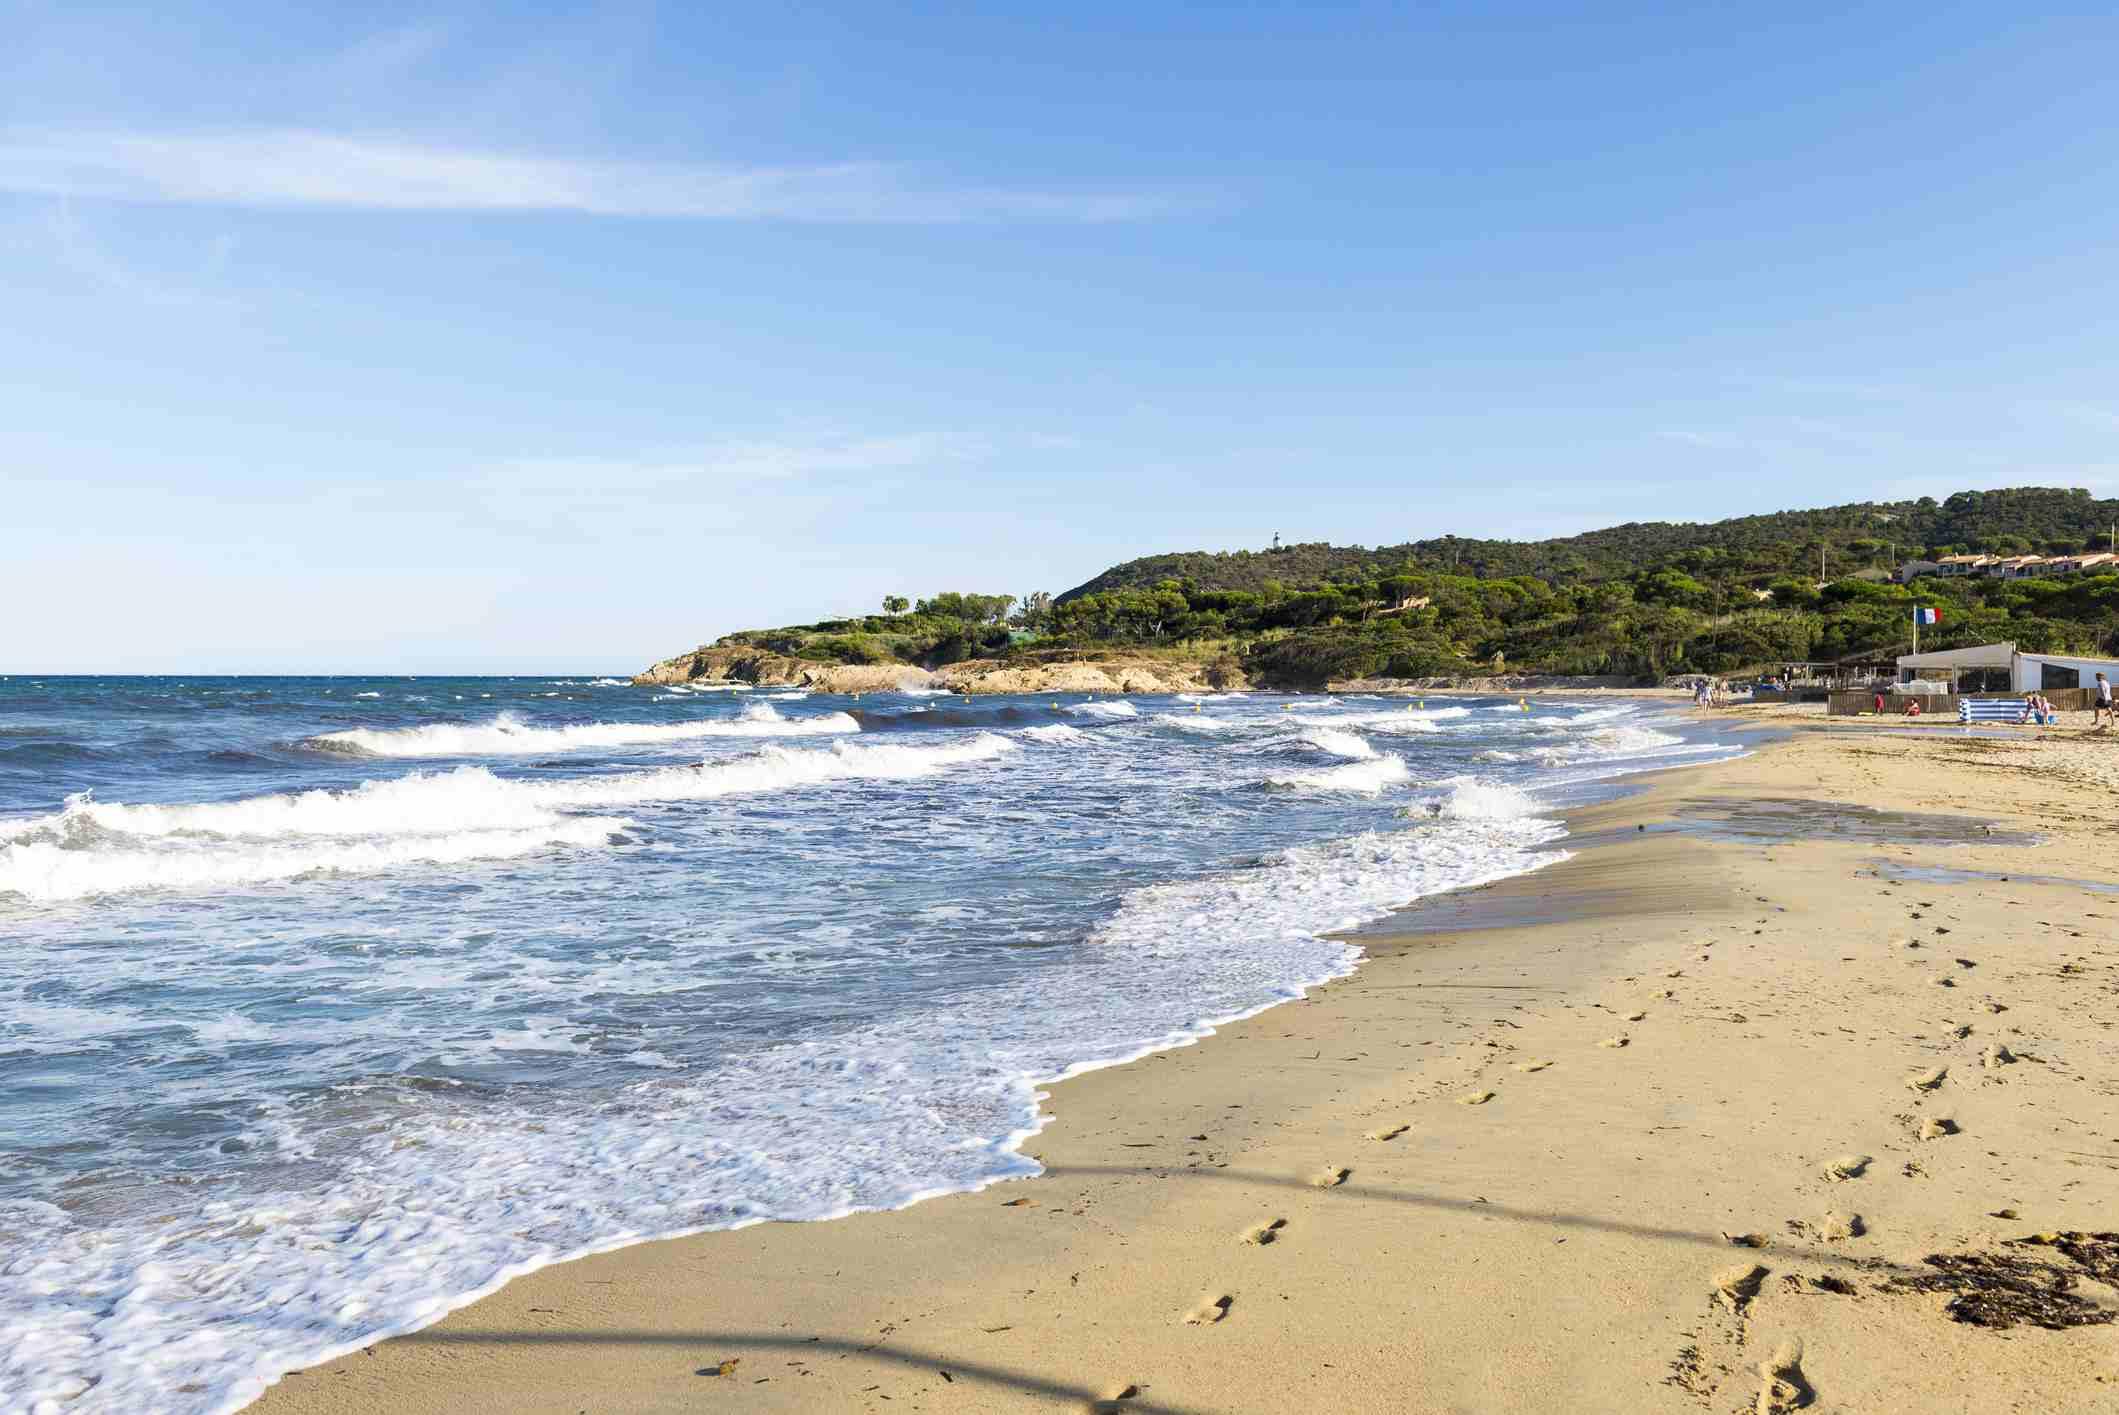 Beach in St. Tropez, France